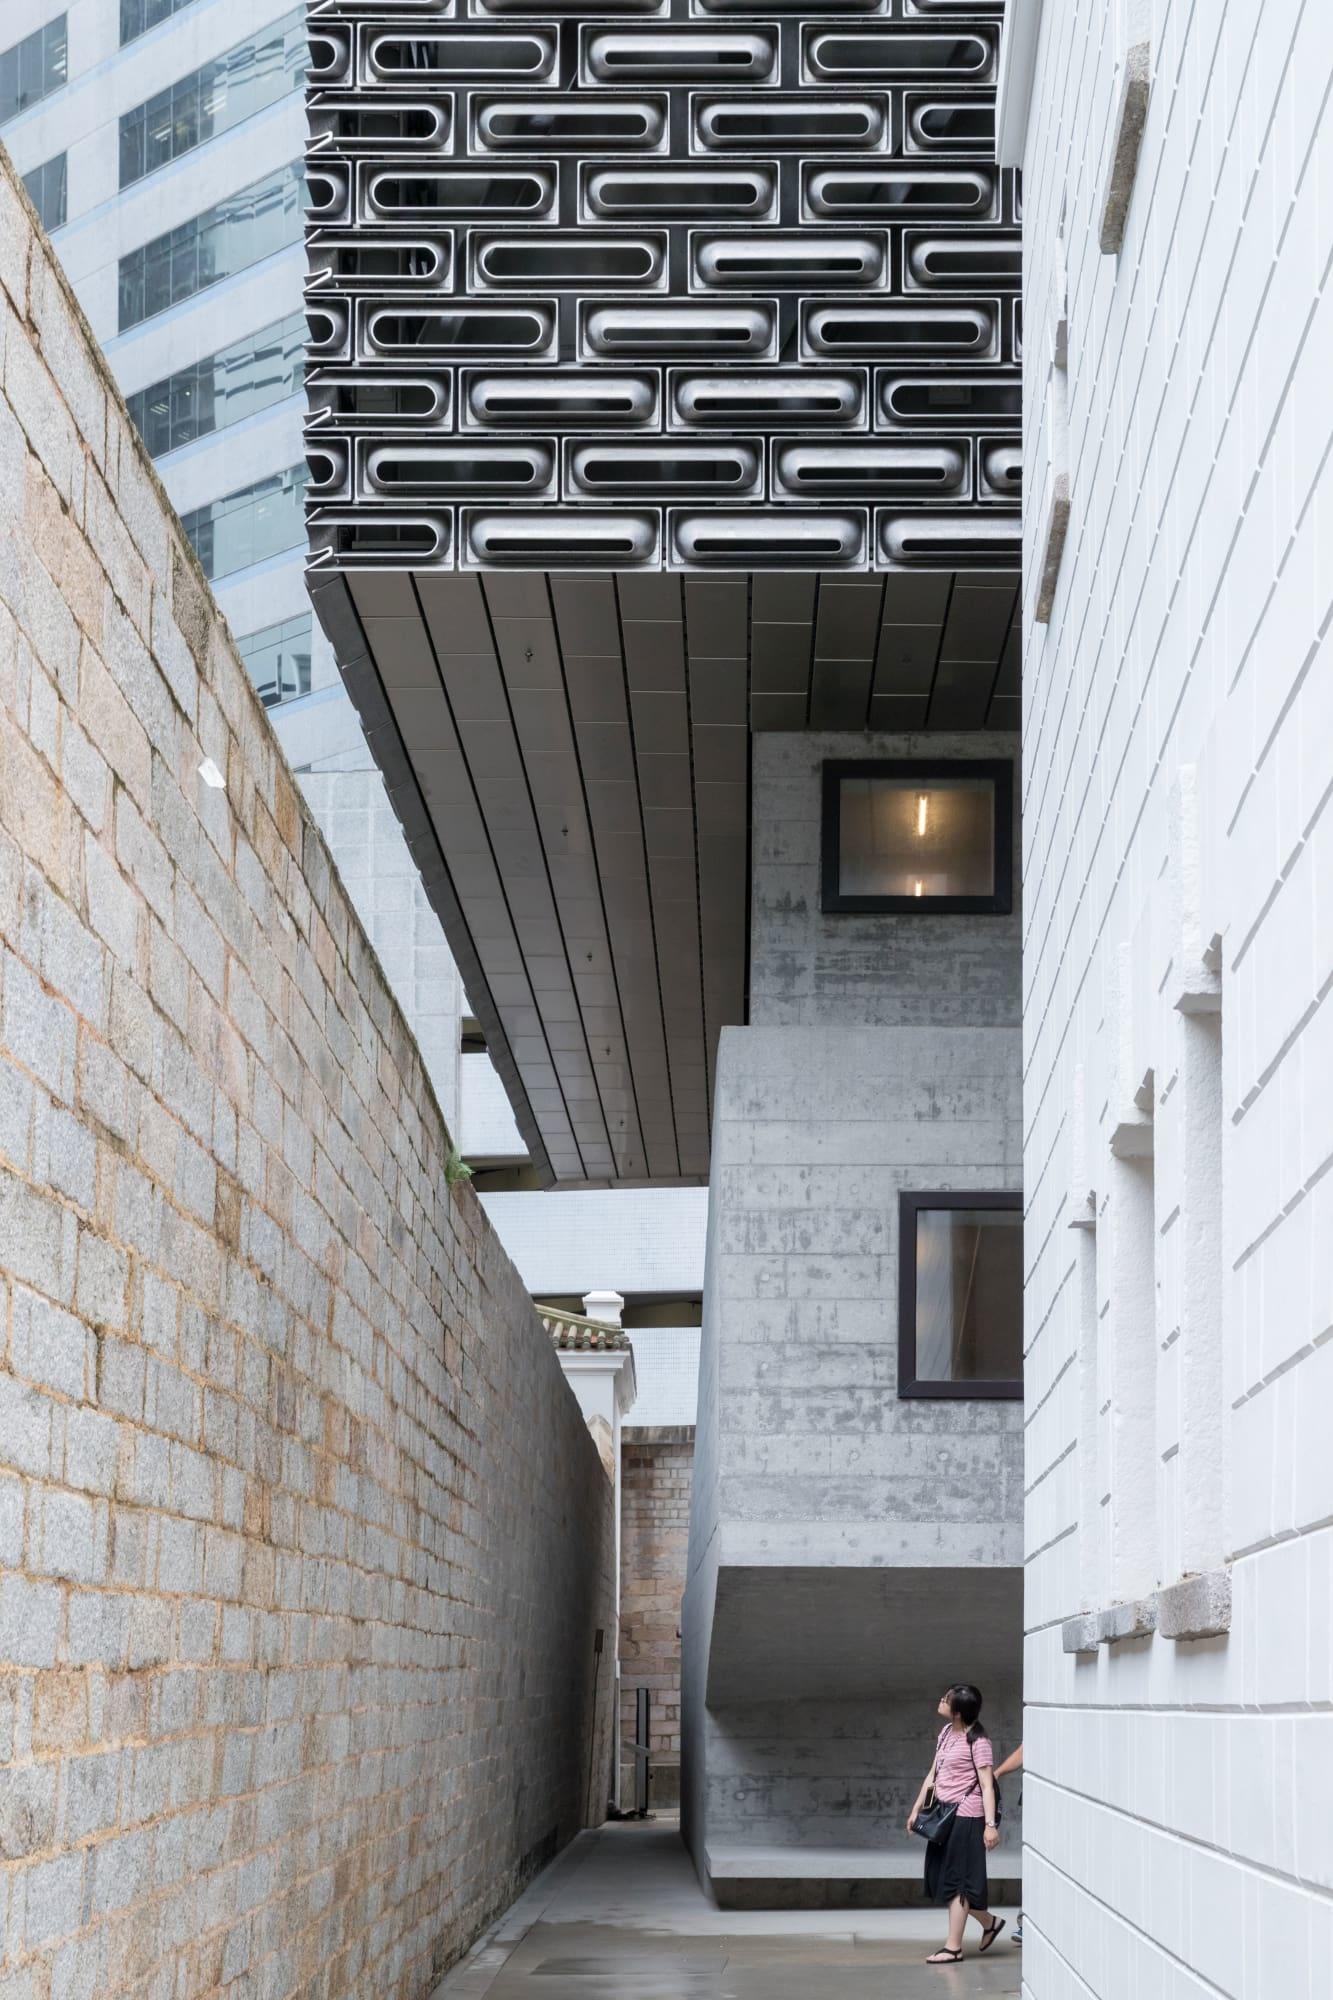 Арт-центр в Гонконге от Herzog & de Meuron (галерея 11, фото 3)